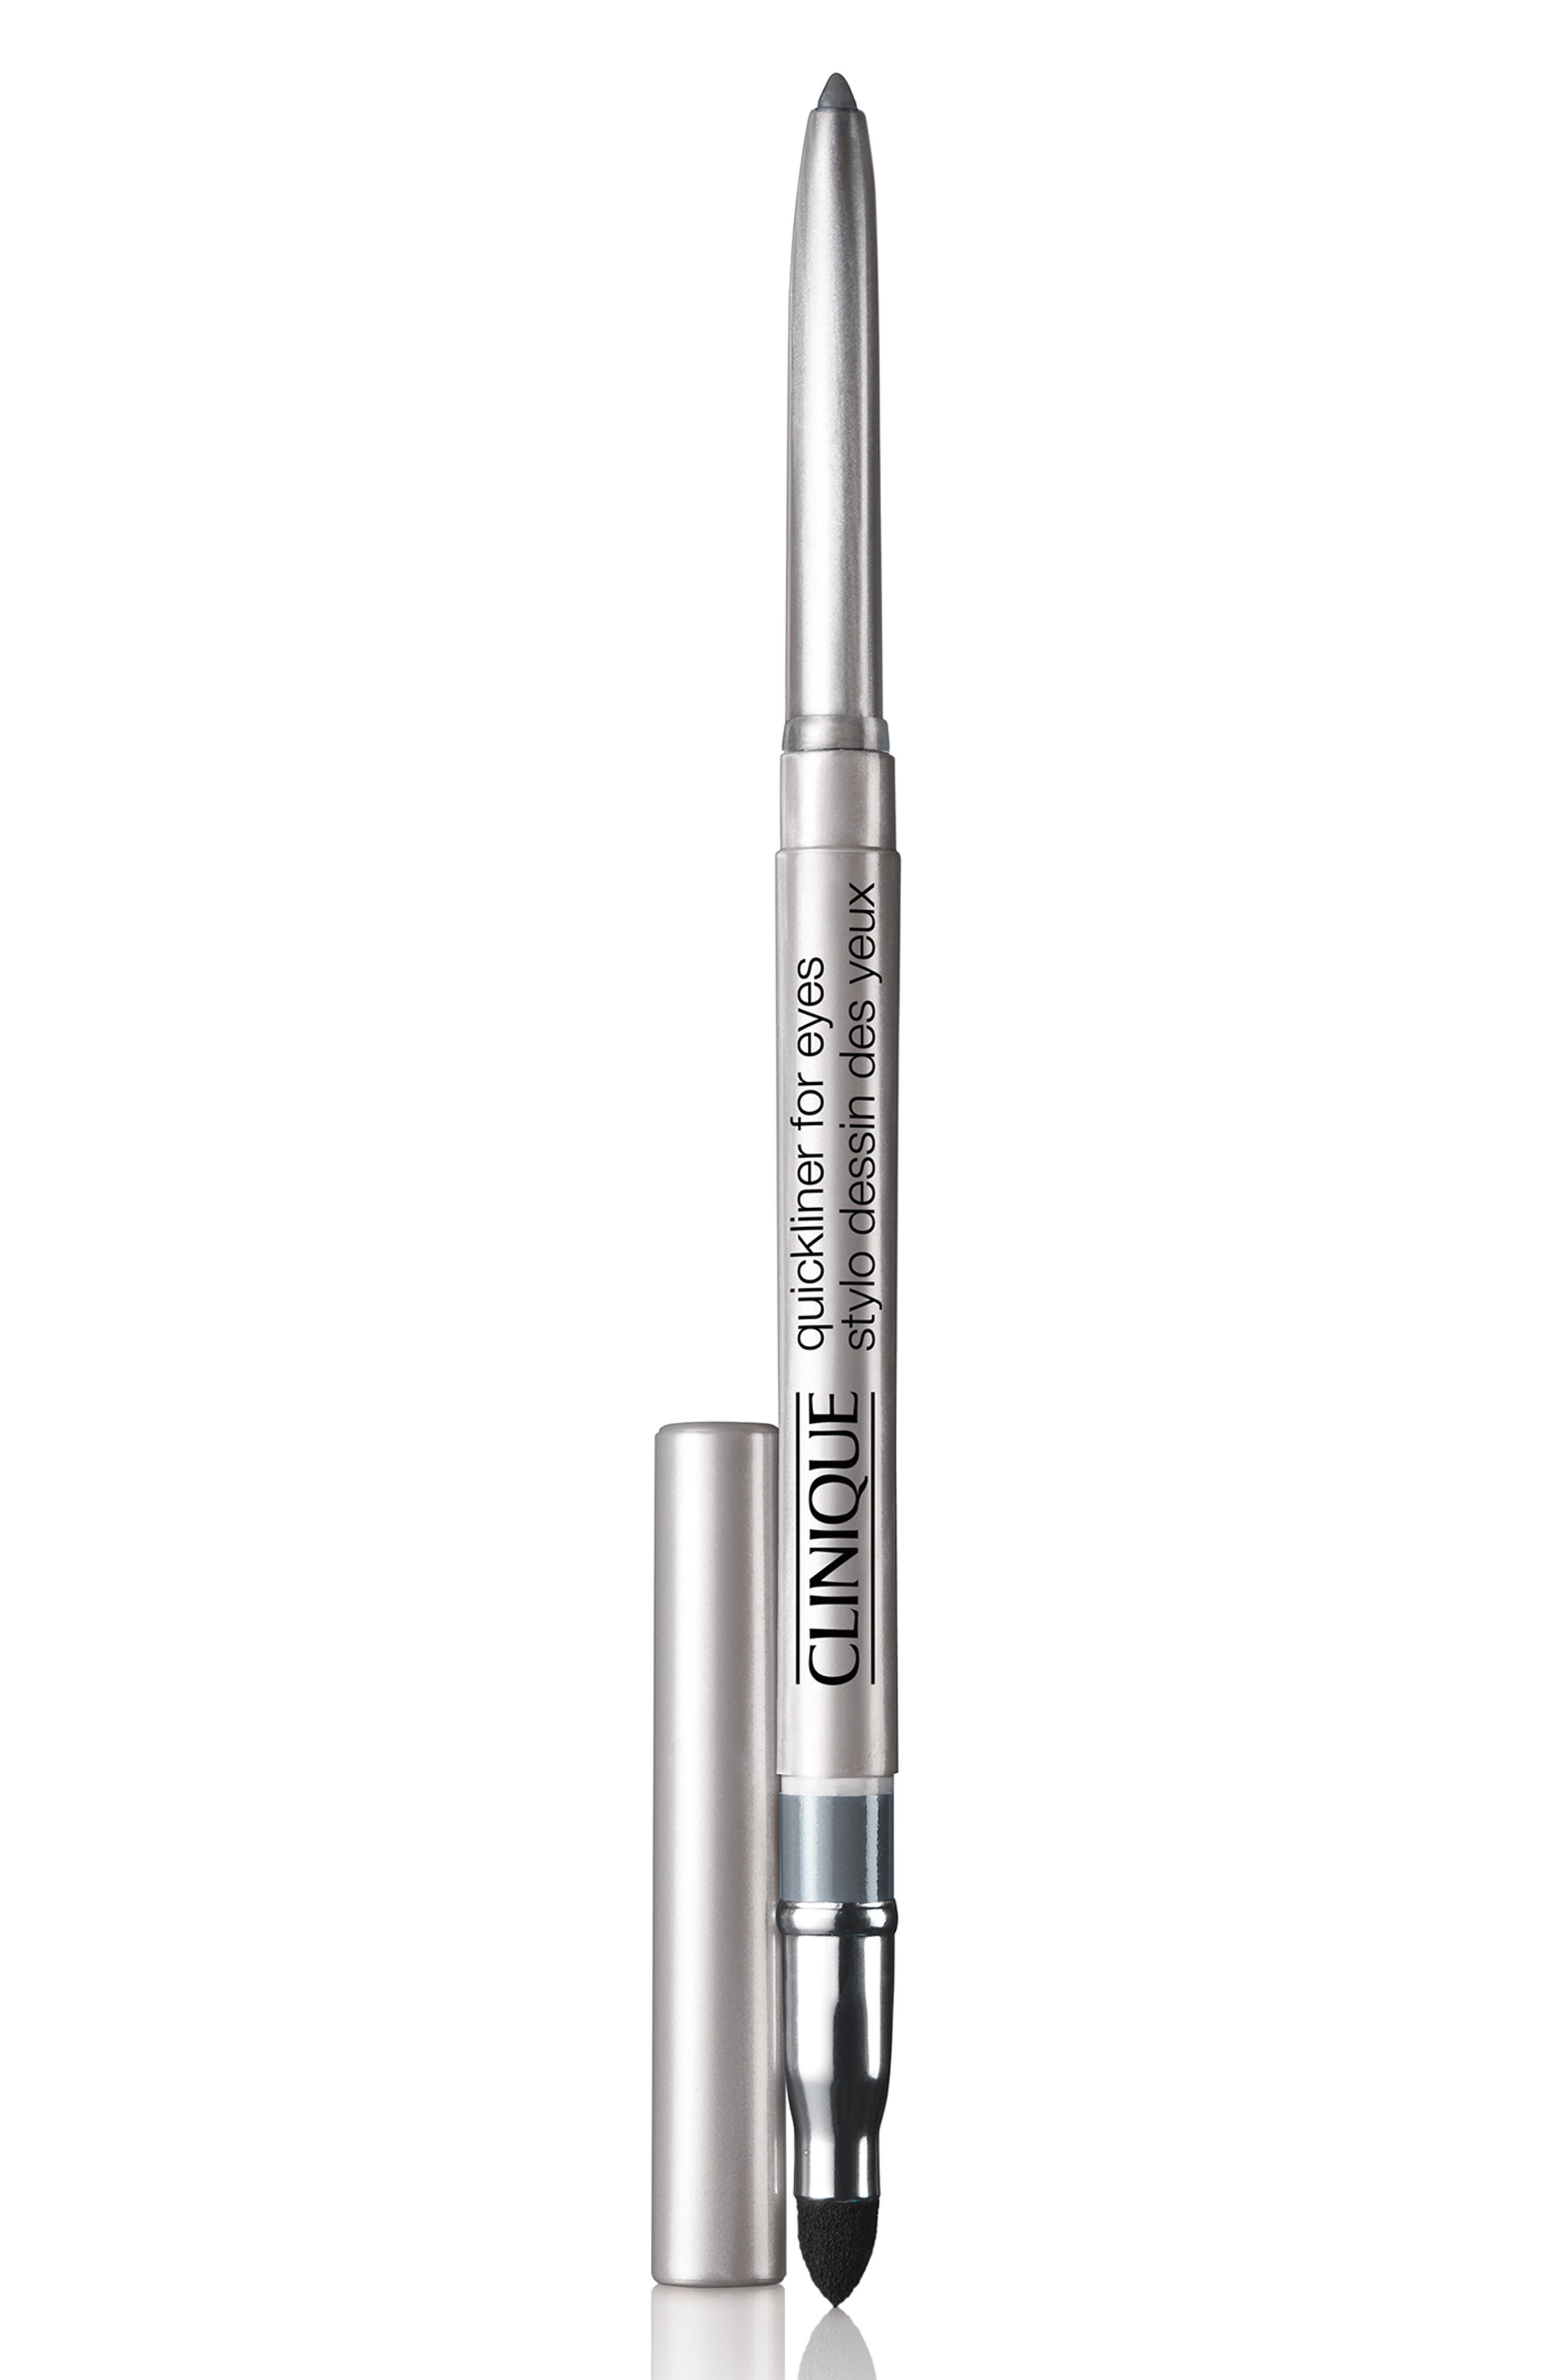 Quickliner For Eyes Eyeliner Pencil